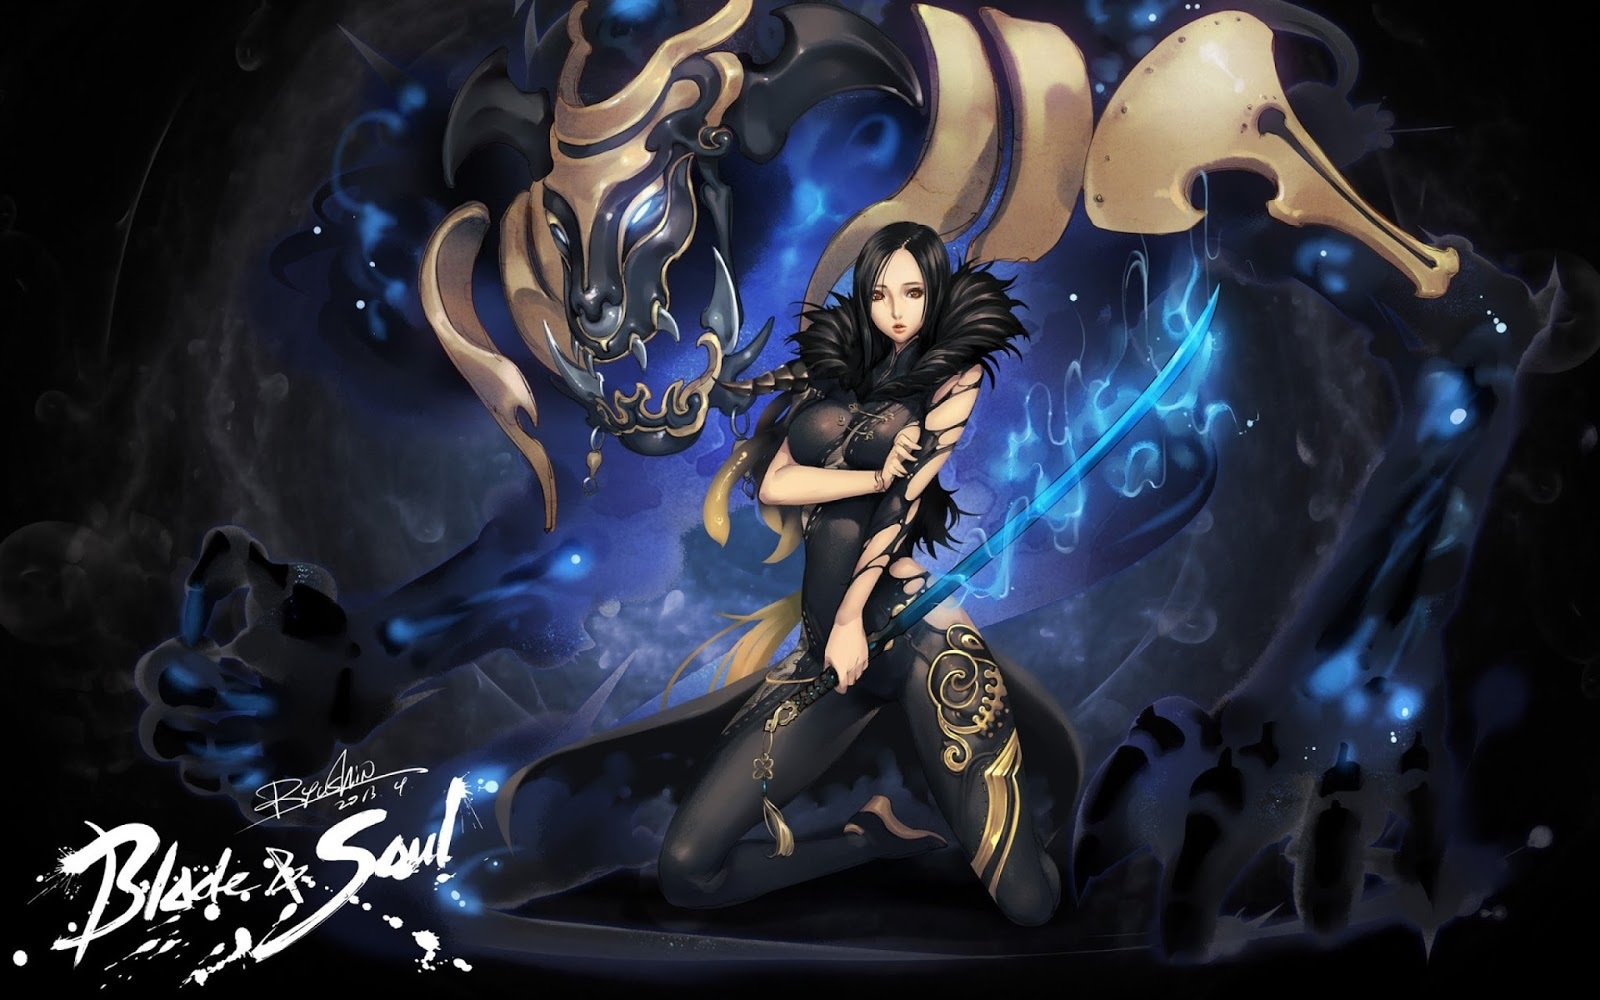 Blade & Soul BD Subtitle Indonesia Batch